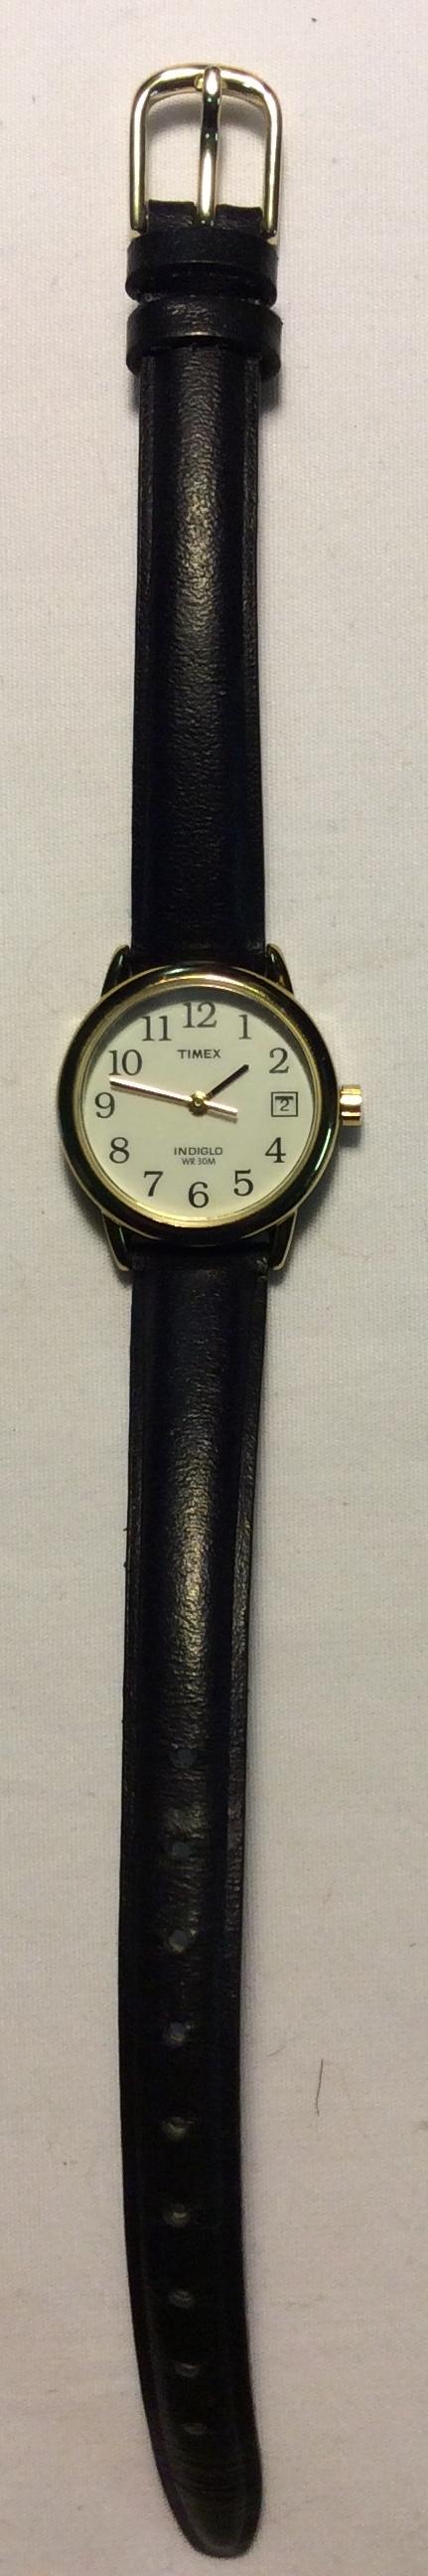 Timex watch - round white face, gold